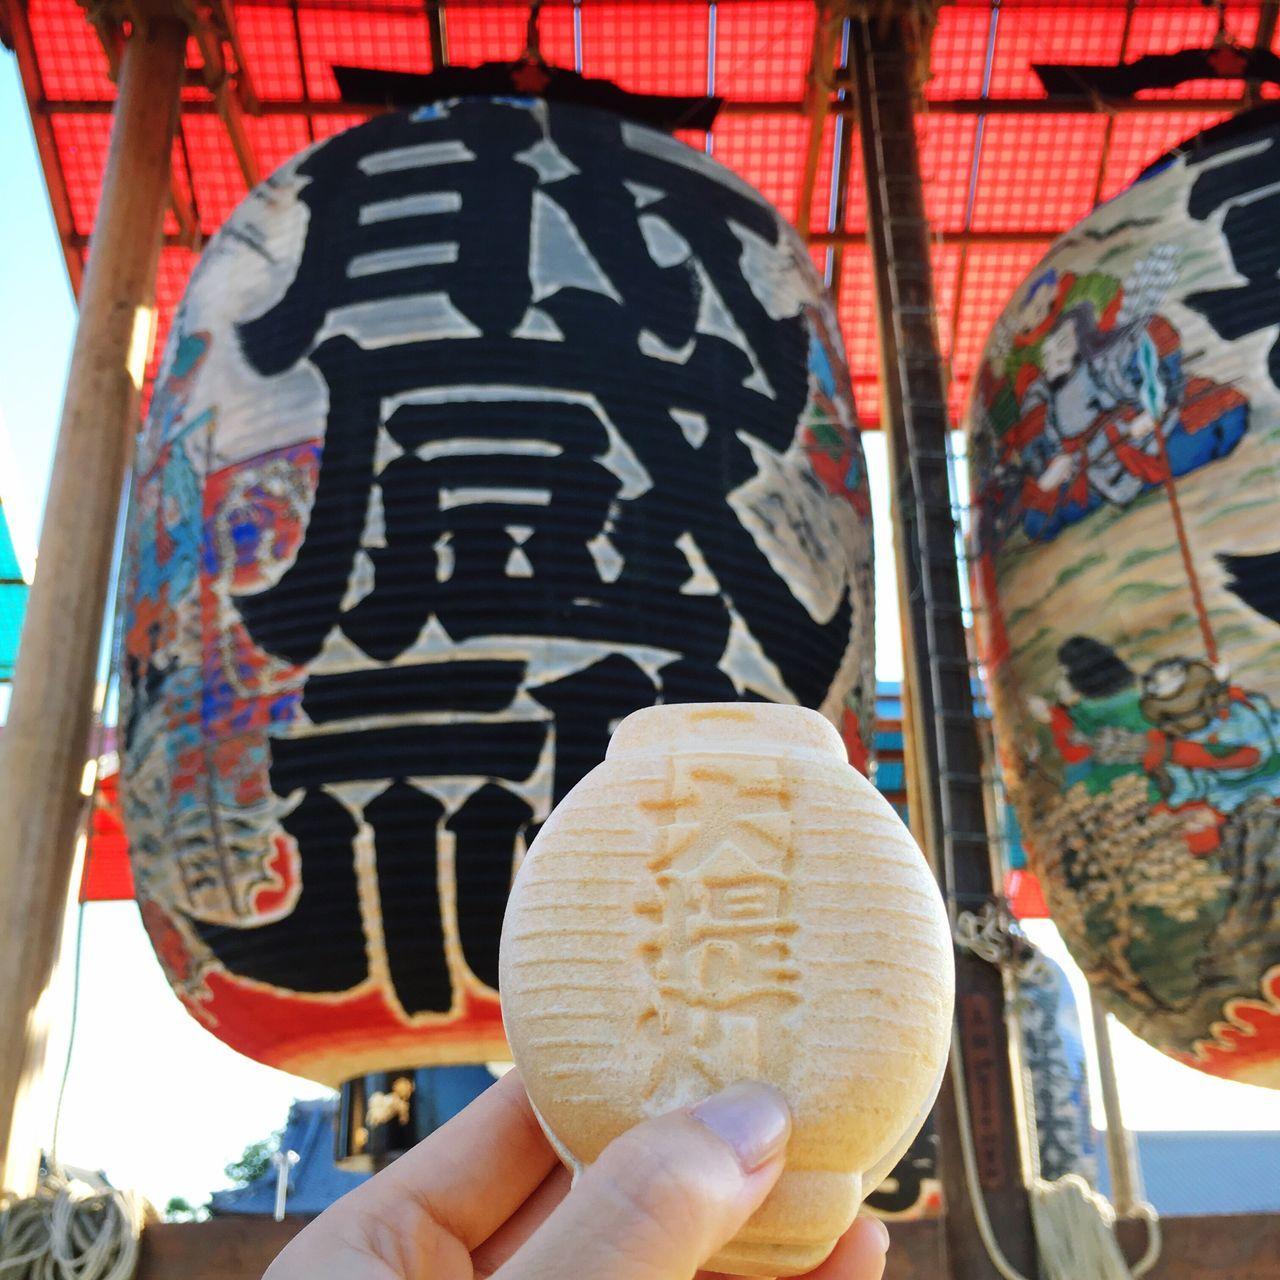 Traditional Culture Japan Shrine Wagashi Sweets BIG Japonism Lantern Festival Neighborhood Map